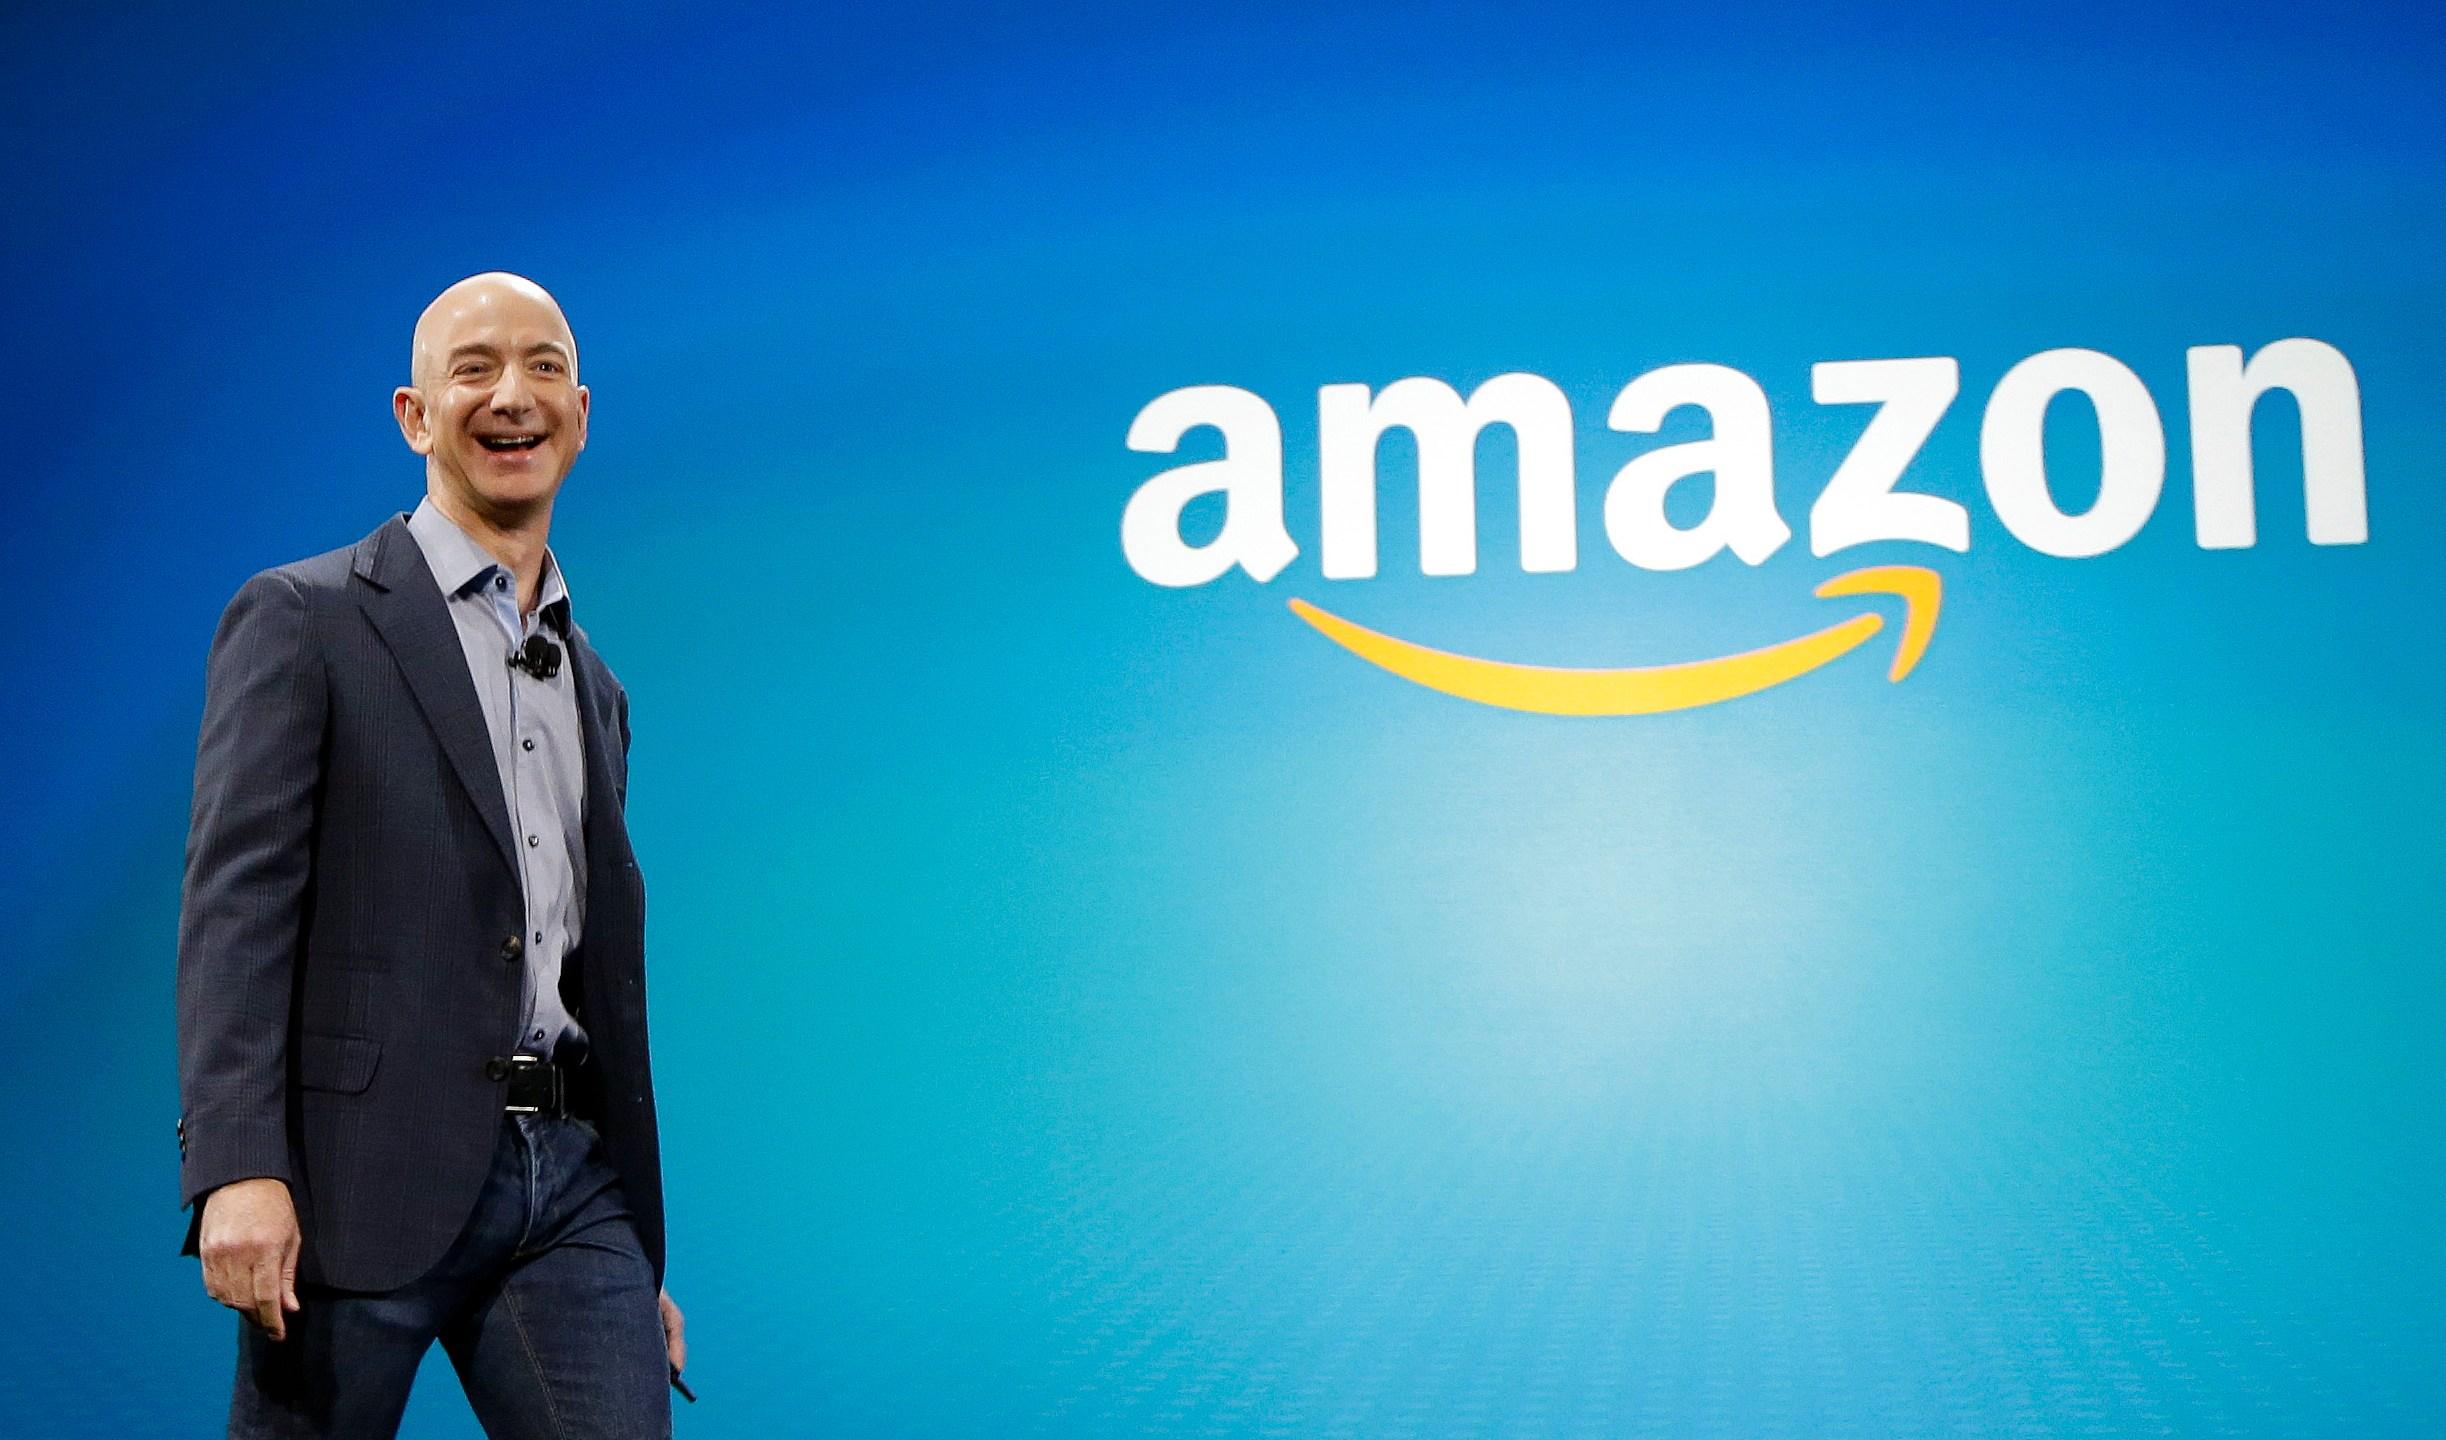 Trillion_Dollar_Amazon_24132-159532.jpg23680993